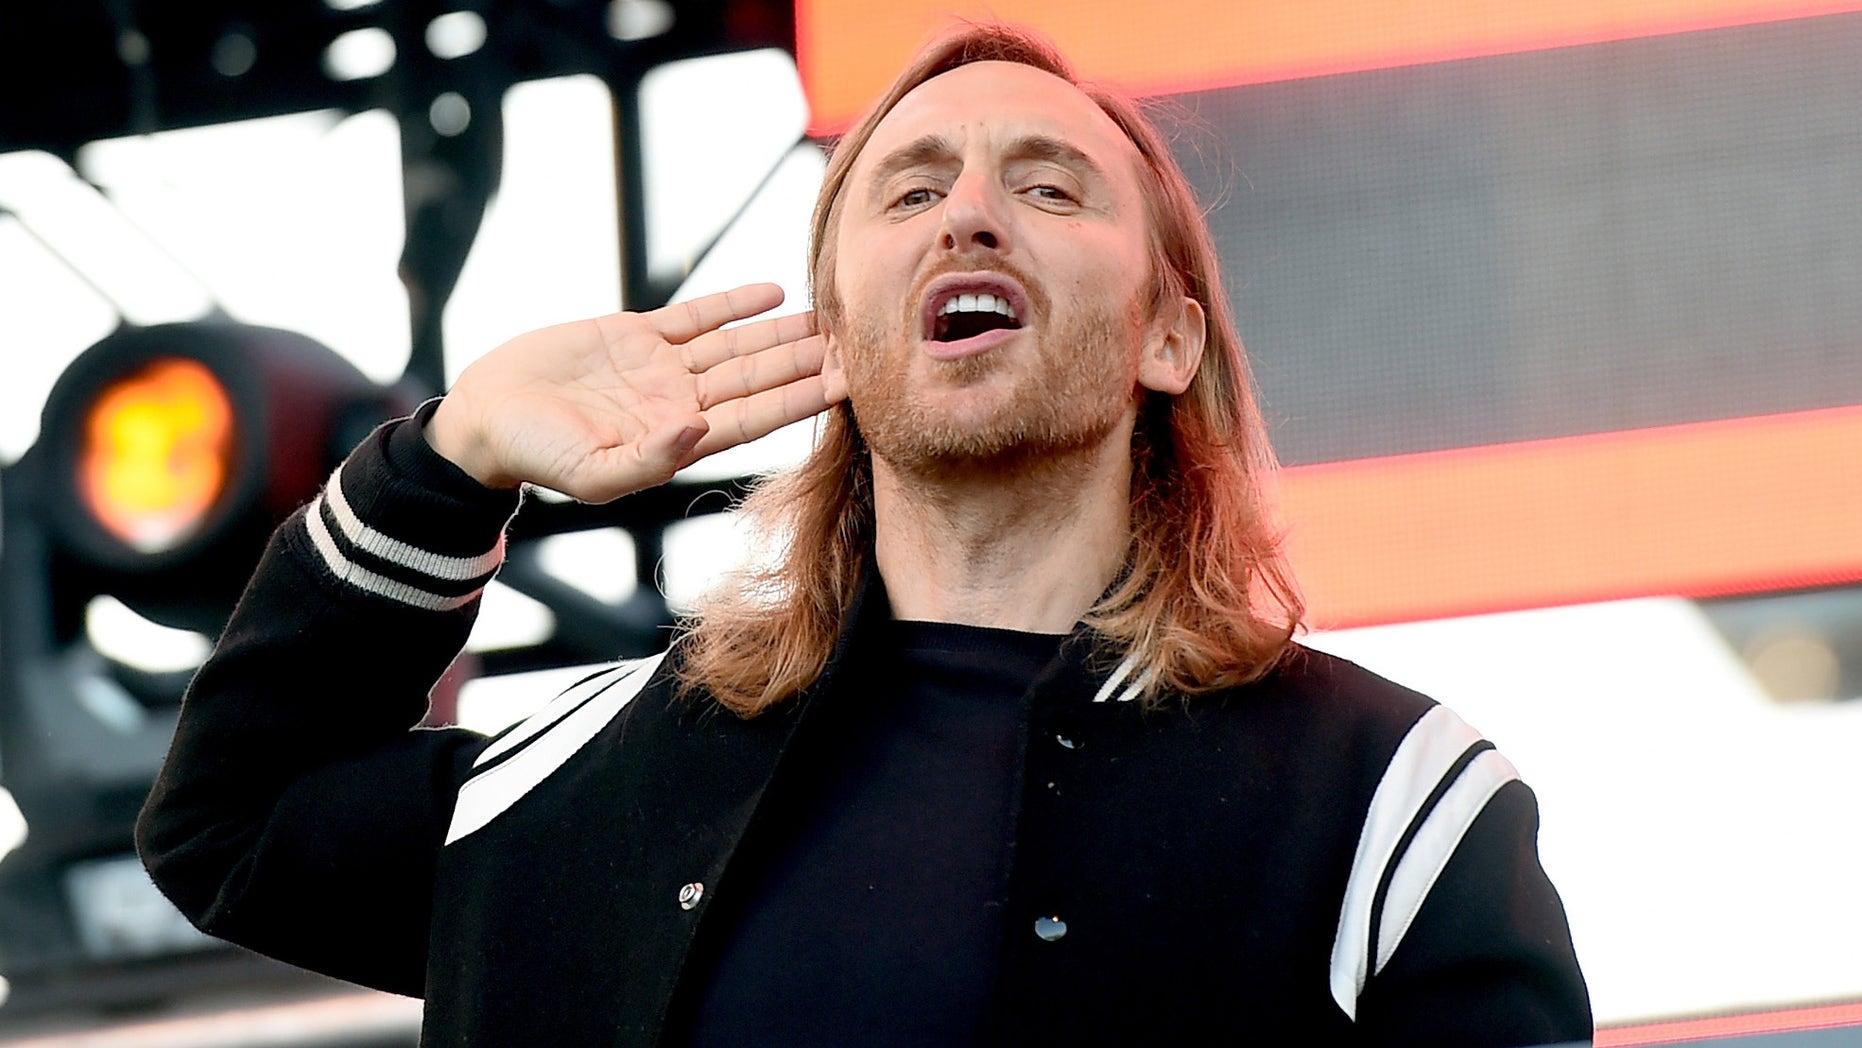 DJ David Guetta on May 9, 2015 in Los Angeles, California.